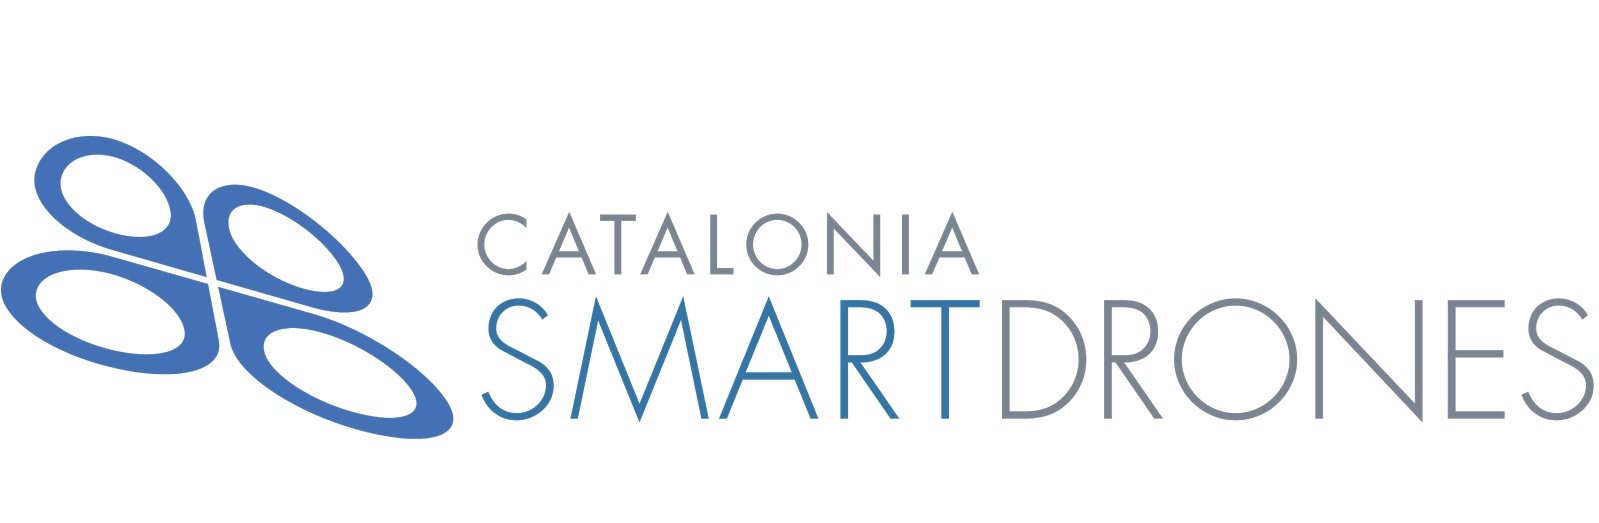 CataloniaSmartDroneS